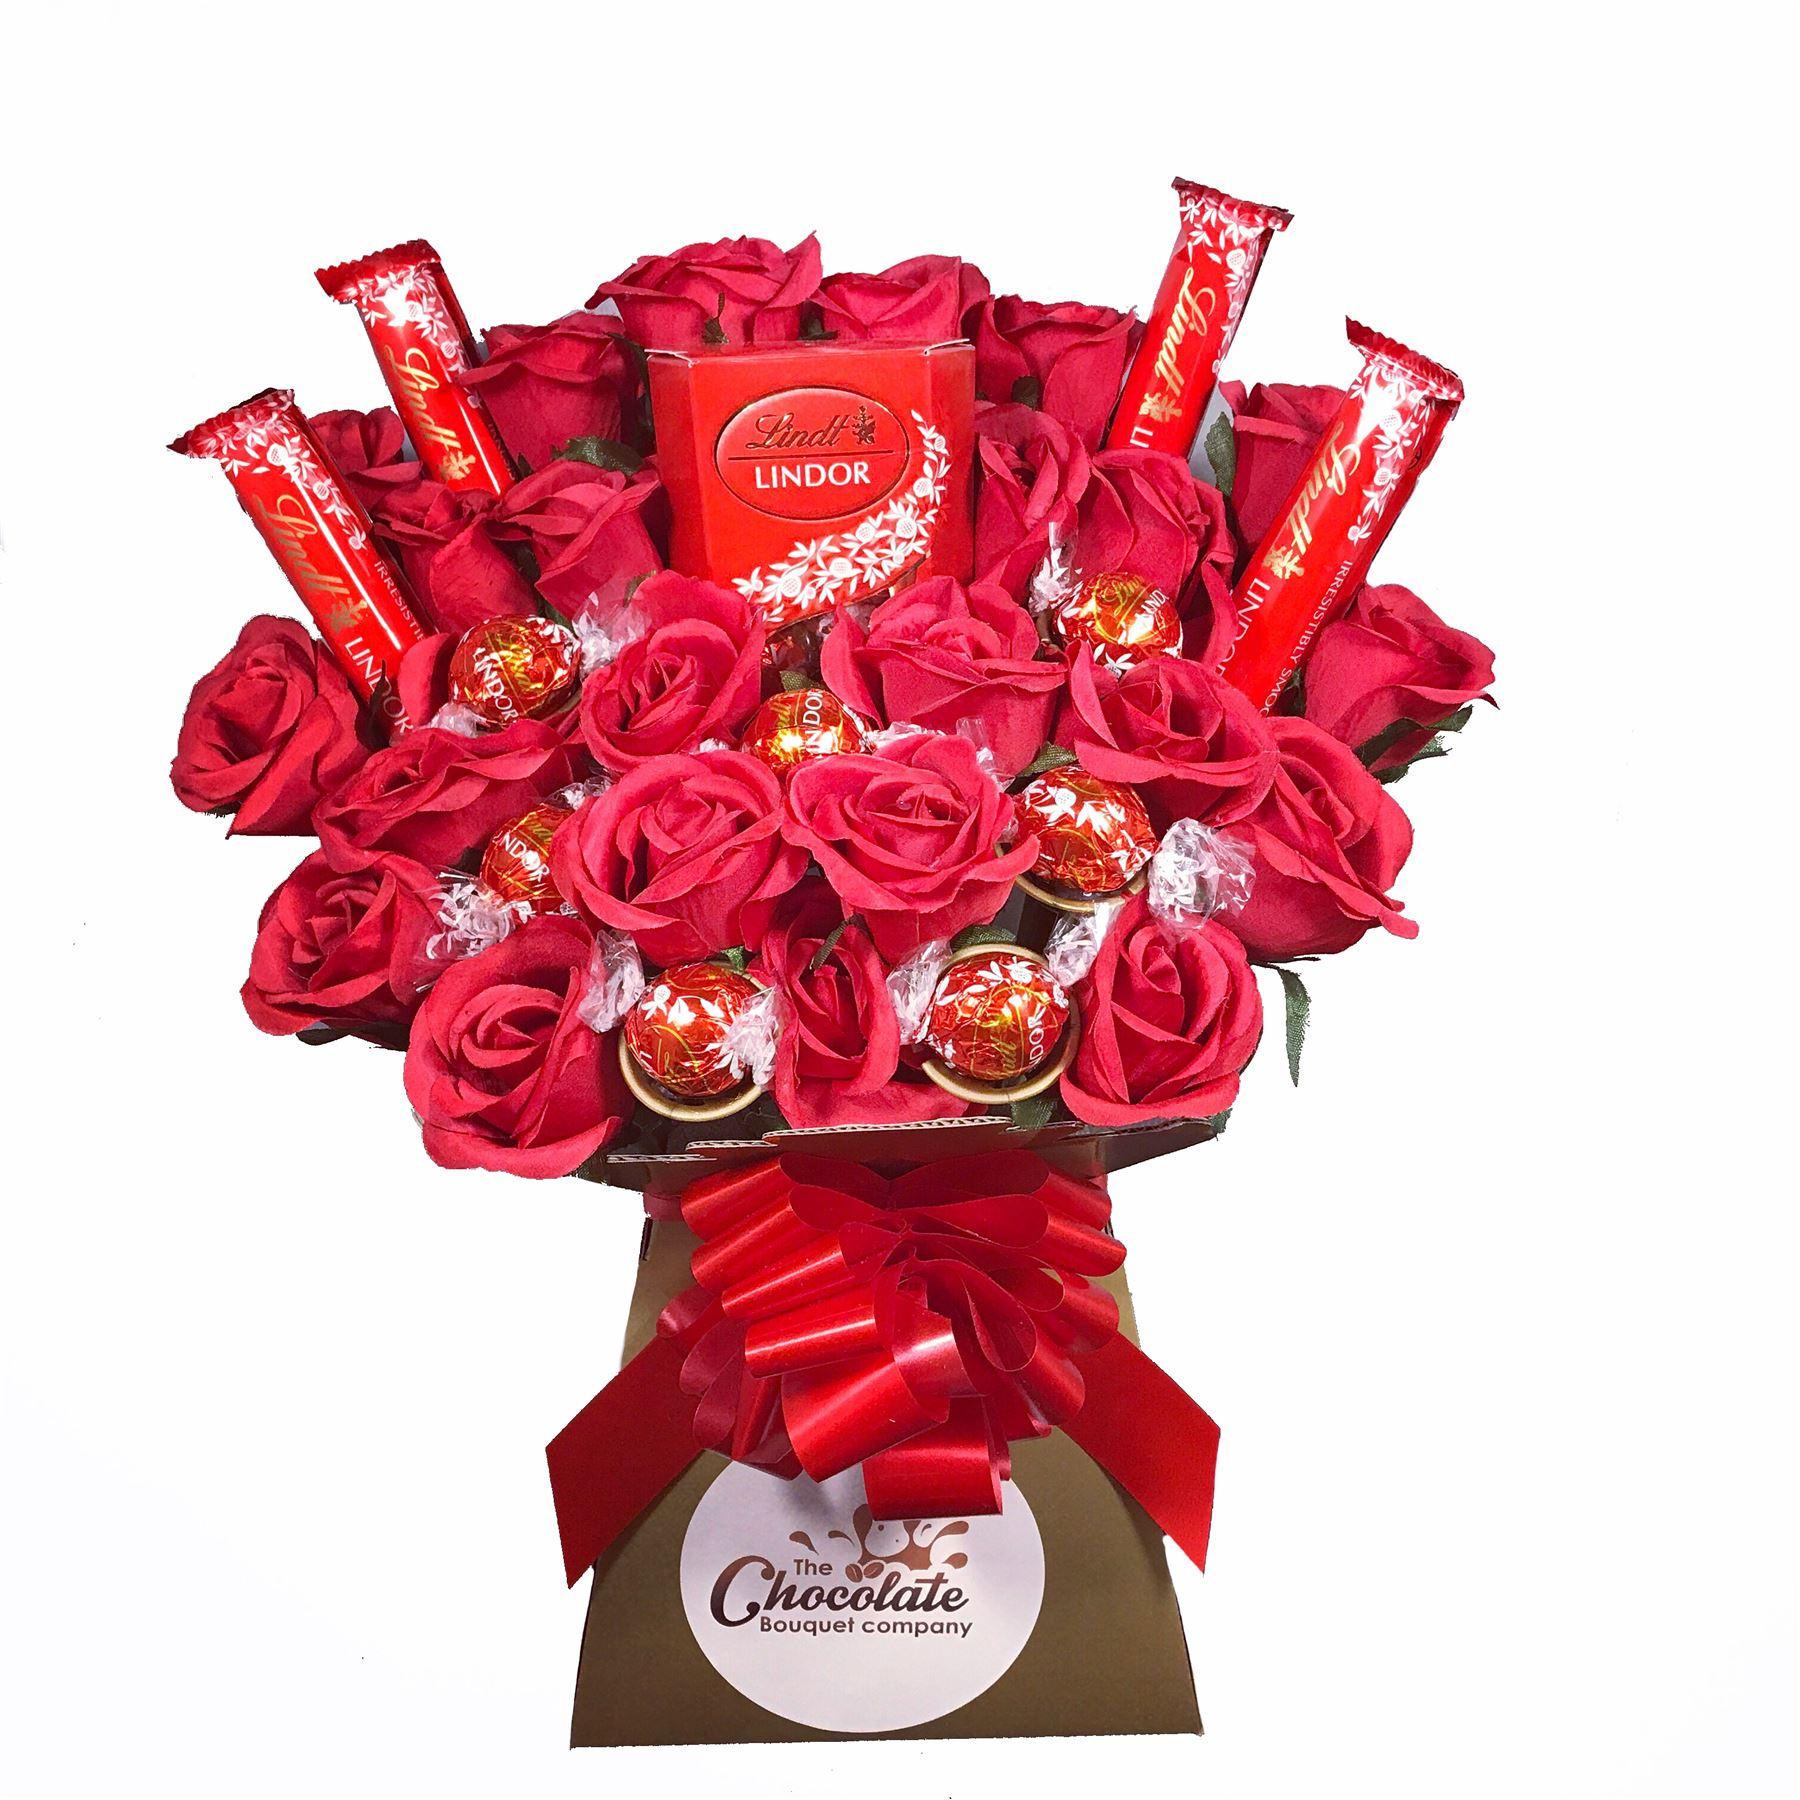 The Lindt Lindor Chocolate Bouquet Ebay